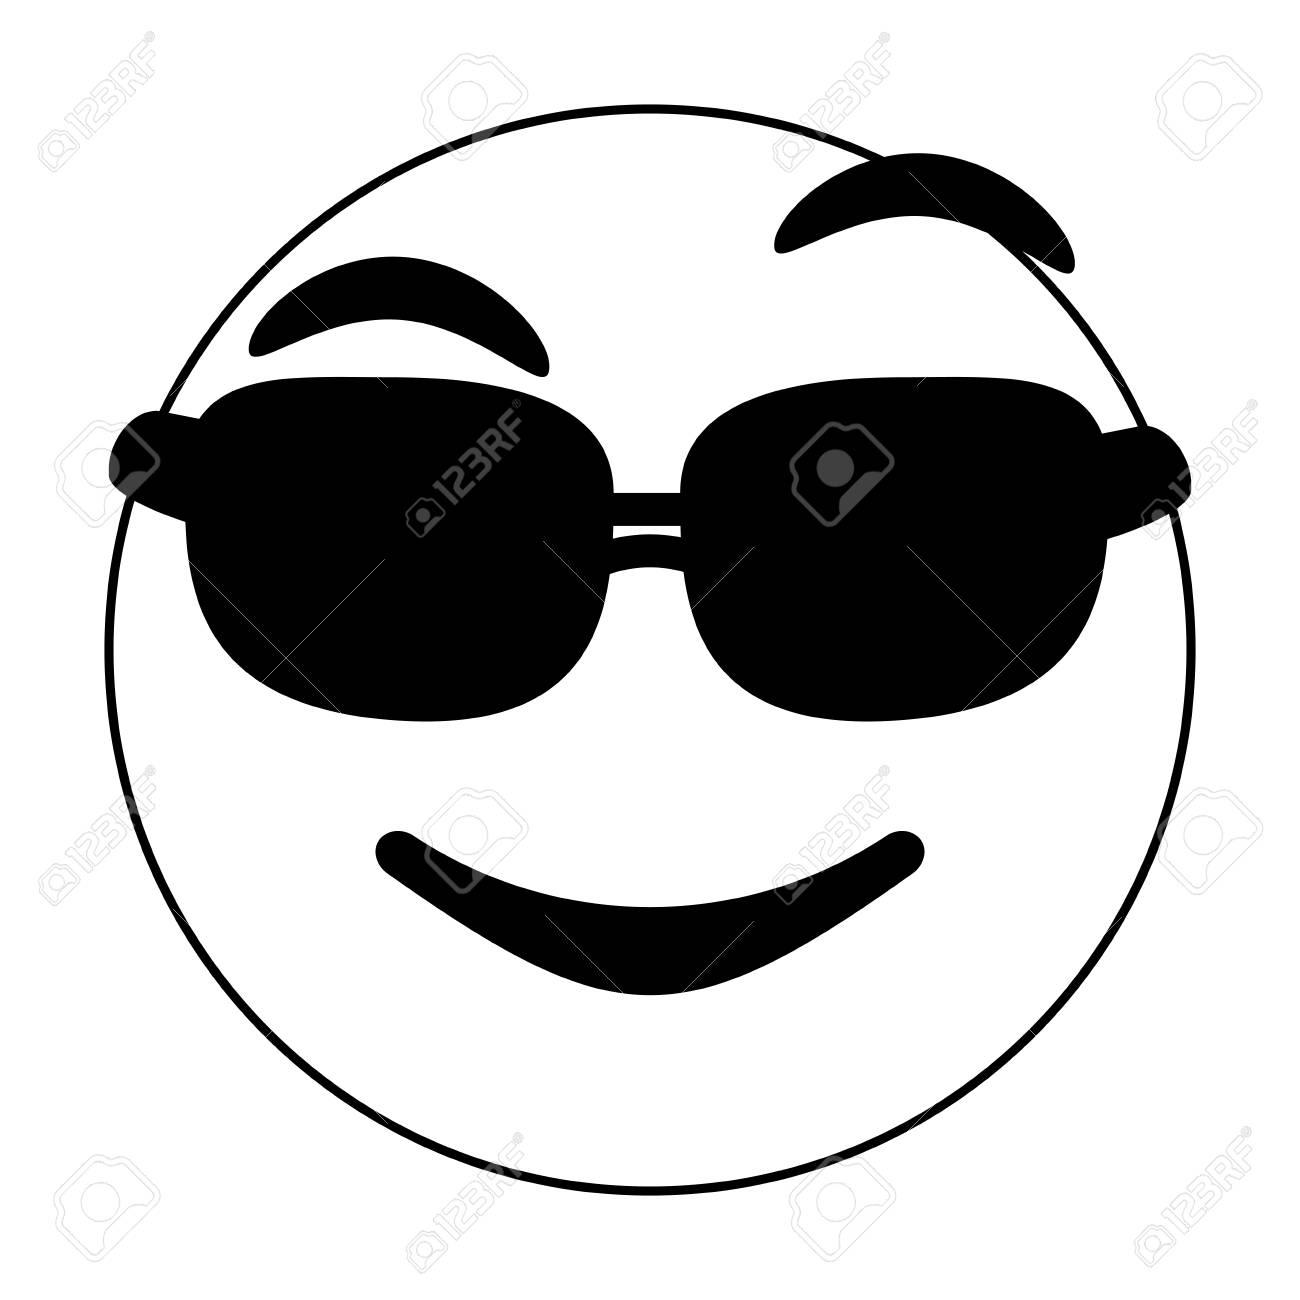 Black and white cool emoji over white background vector illustration.